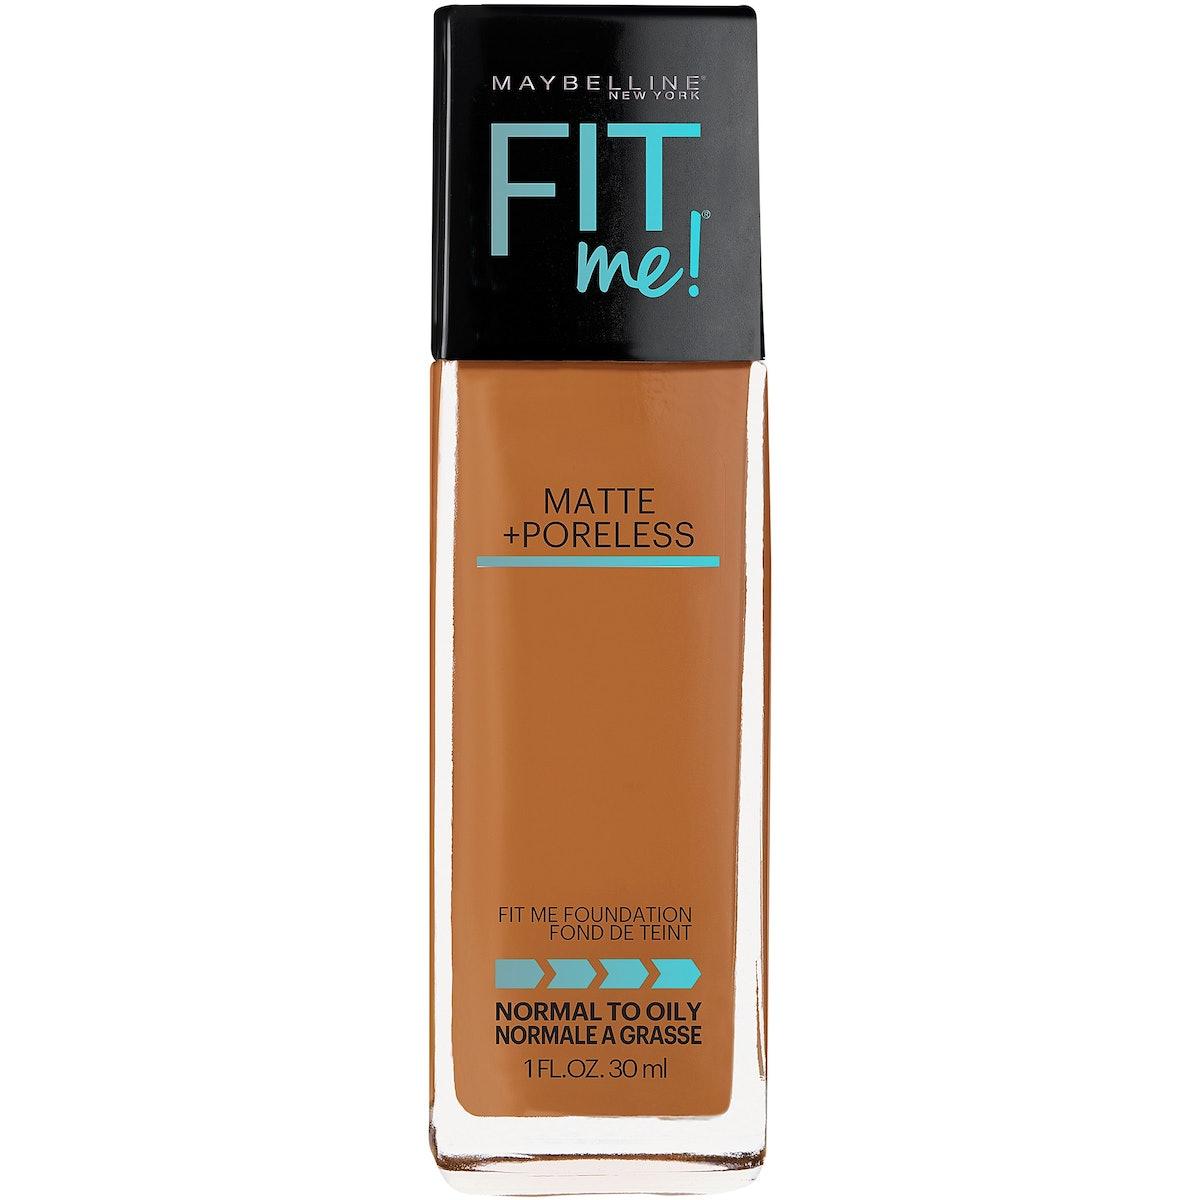 Maybelline New York Fit Me Matte + Poreless Foundation